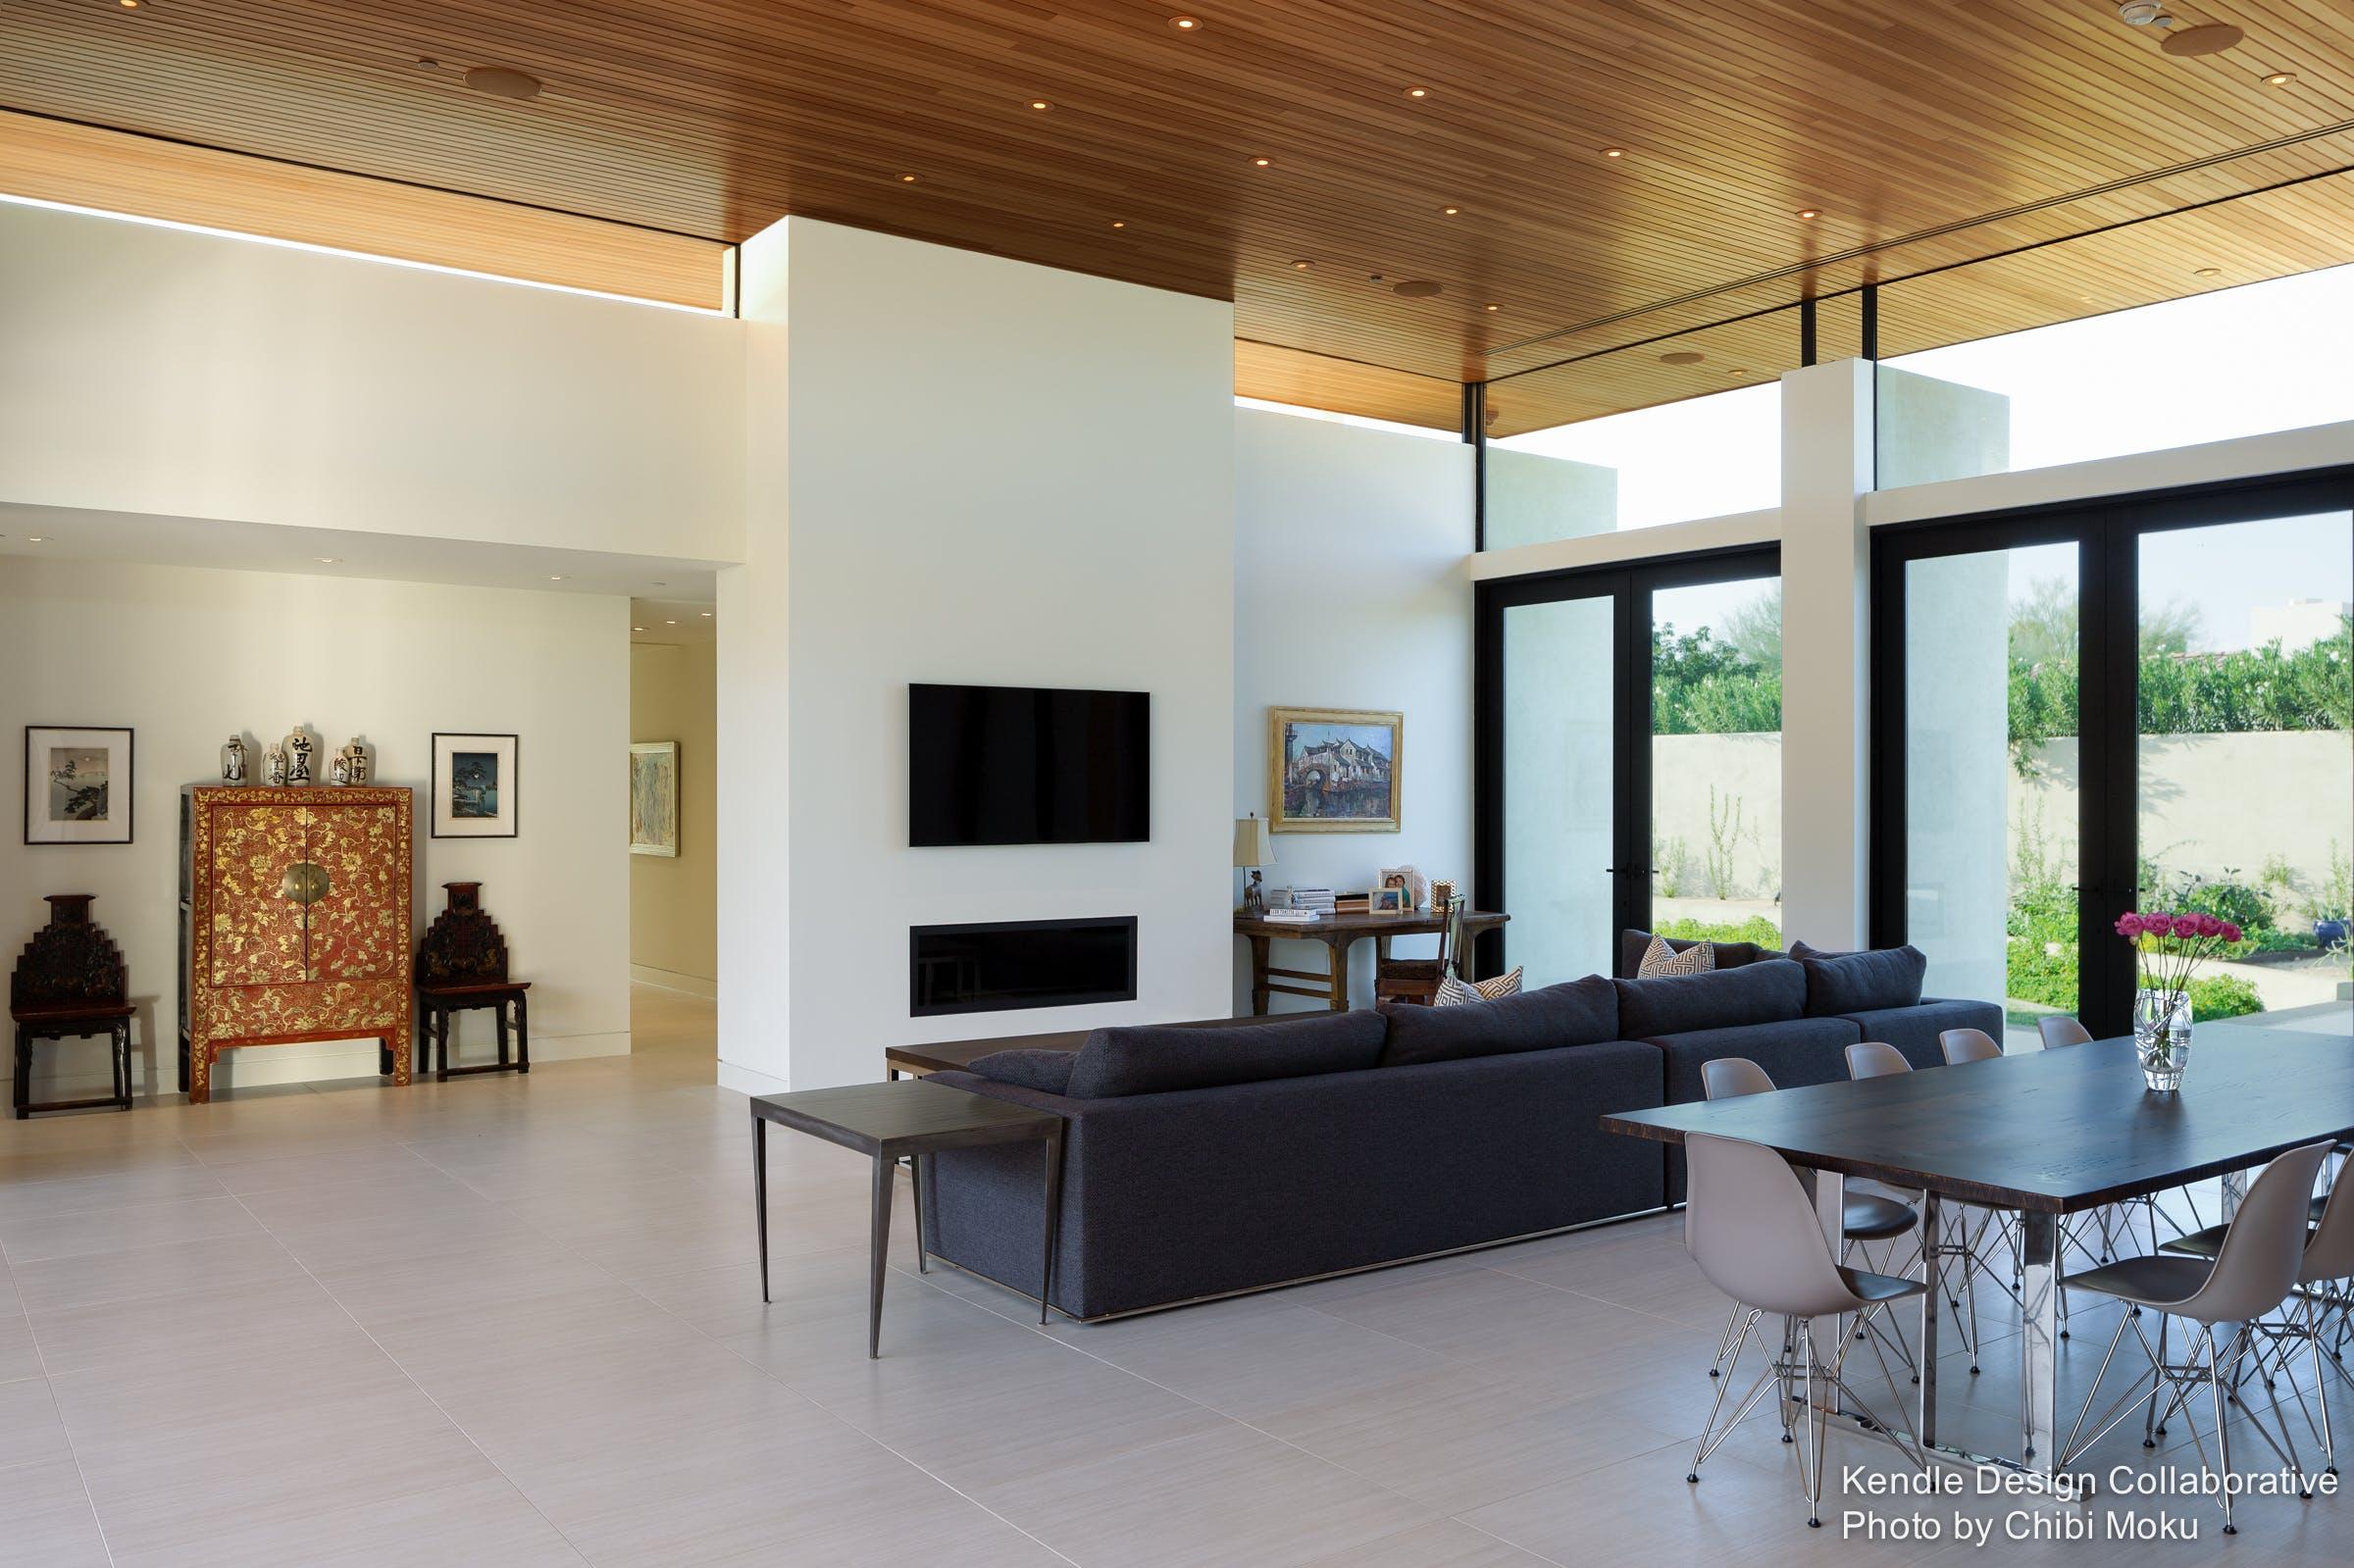 House design documentary - Interior Design Videography Documentaries Construction Video Interior Photographer Interior Design Videographer